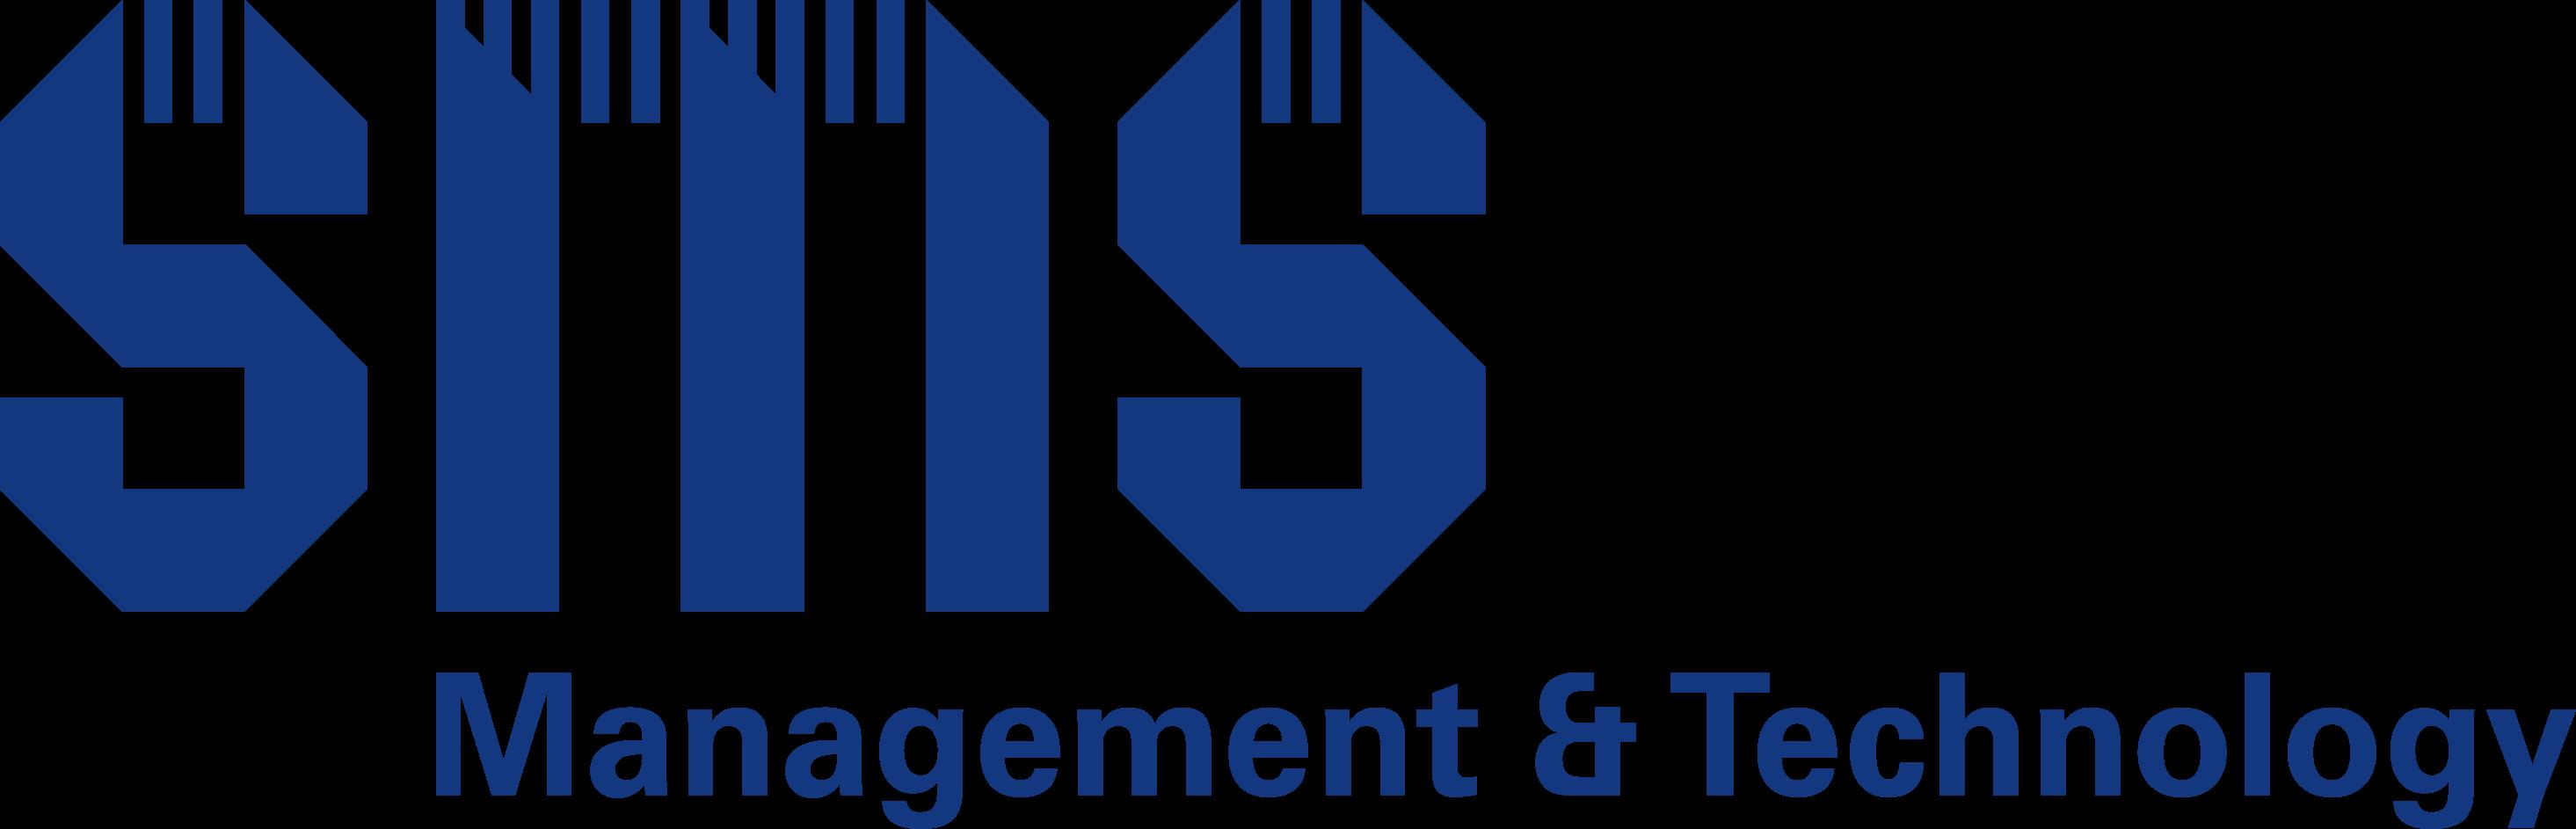 Technology Management Image: Sms Management & Technology Company Profile